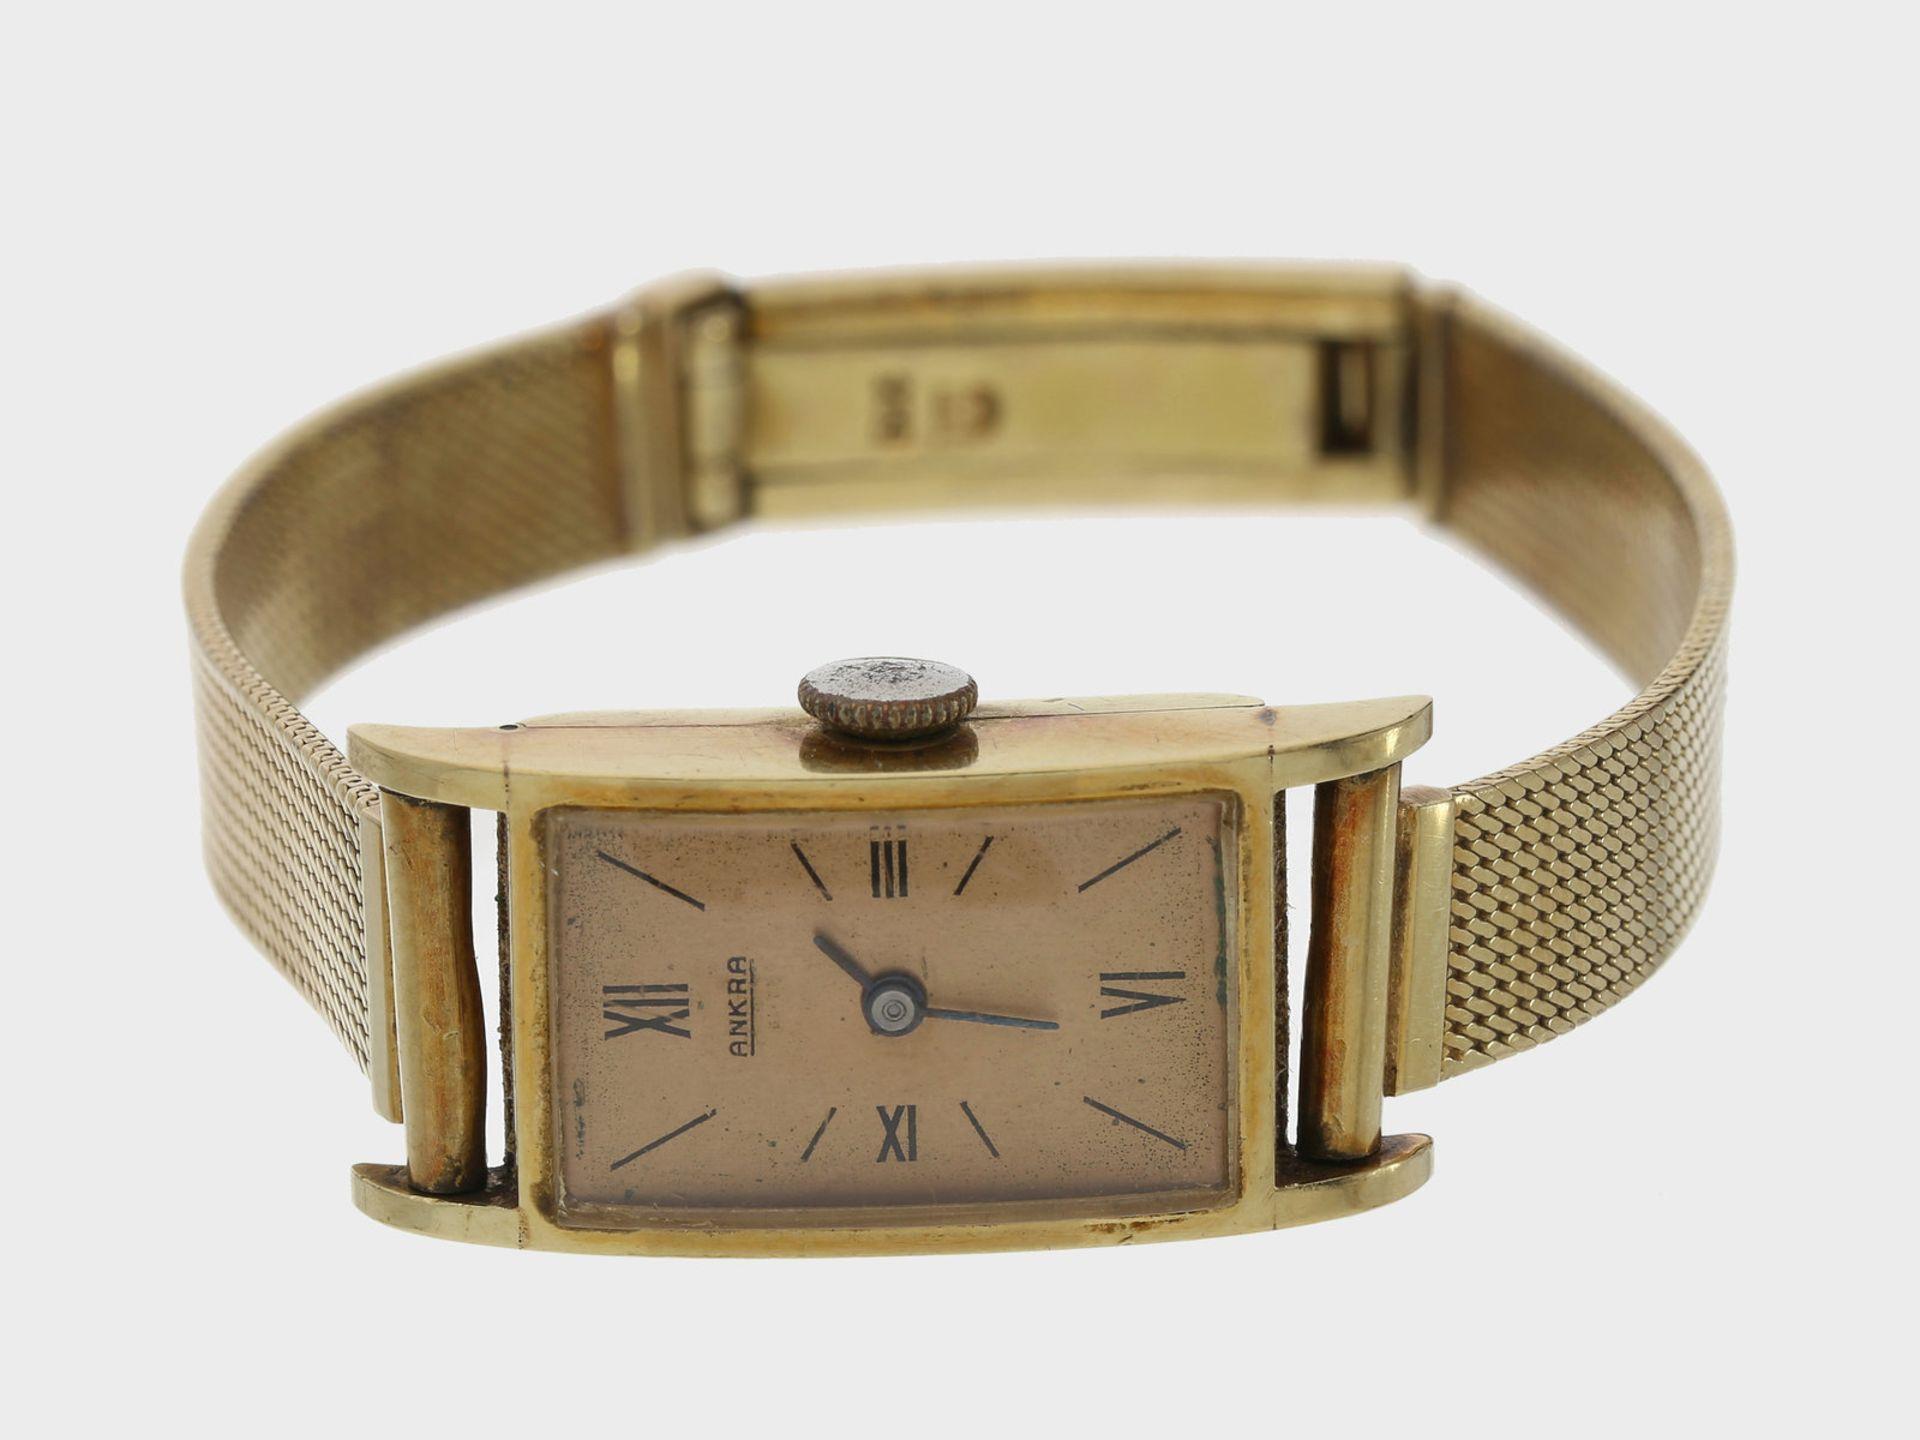 Armbanduhr: 14K goldene Damenuhr der Marke Ankra, vintage Ca. 17cm lang, Gehäuse ca. 21 x 14mm, ca.